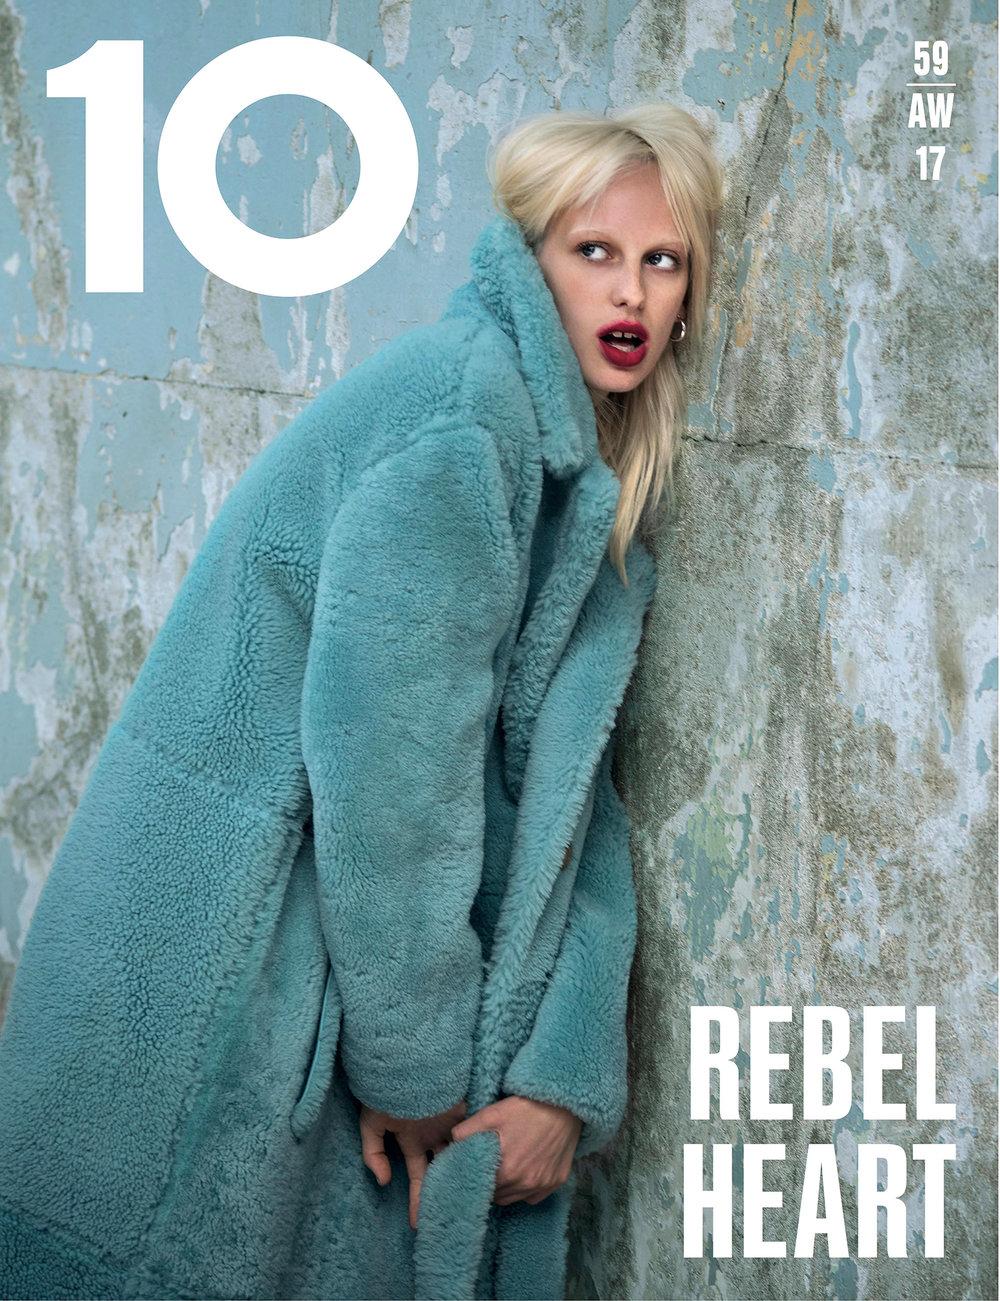 Lili Sumner for 10 magazine.